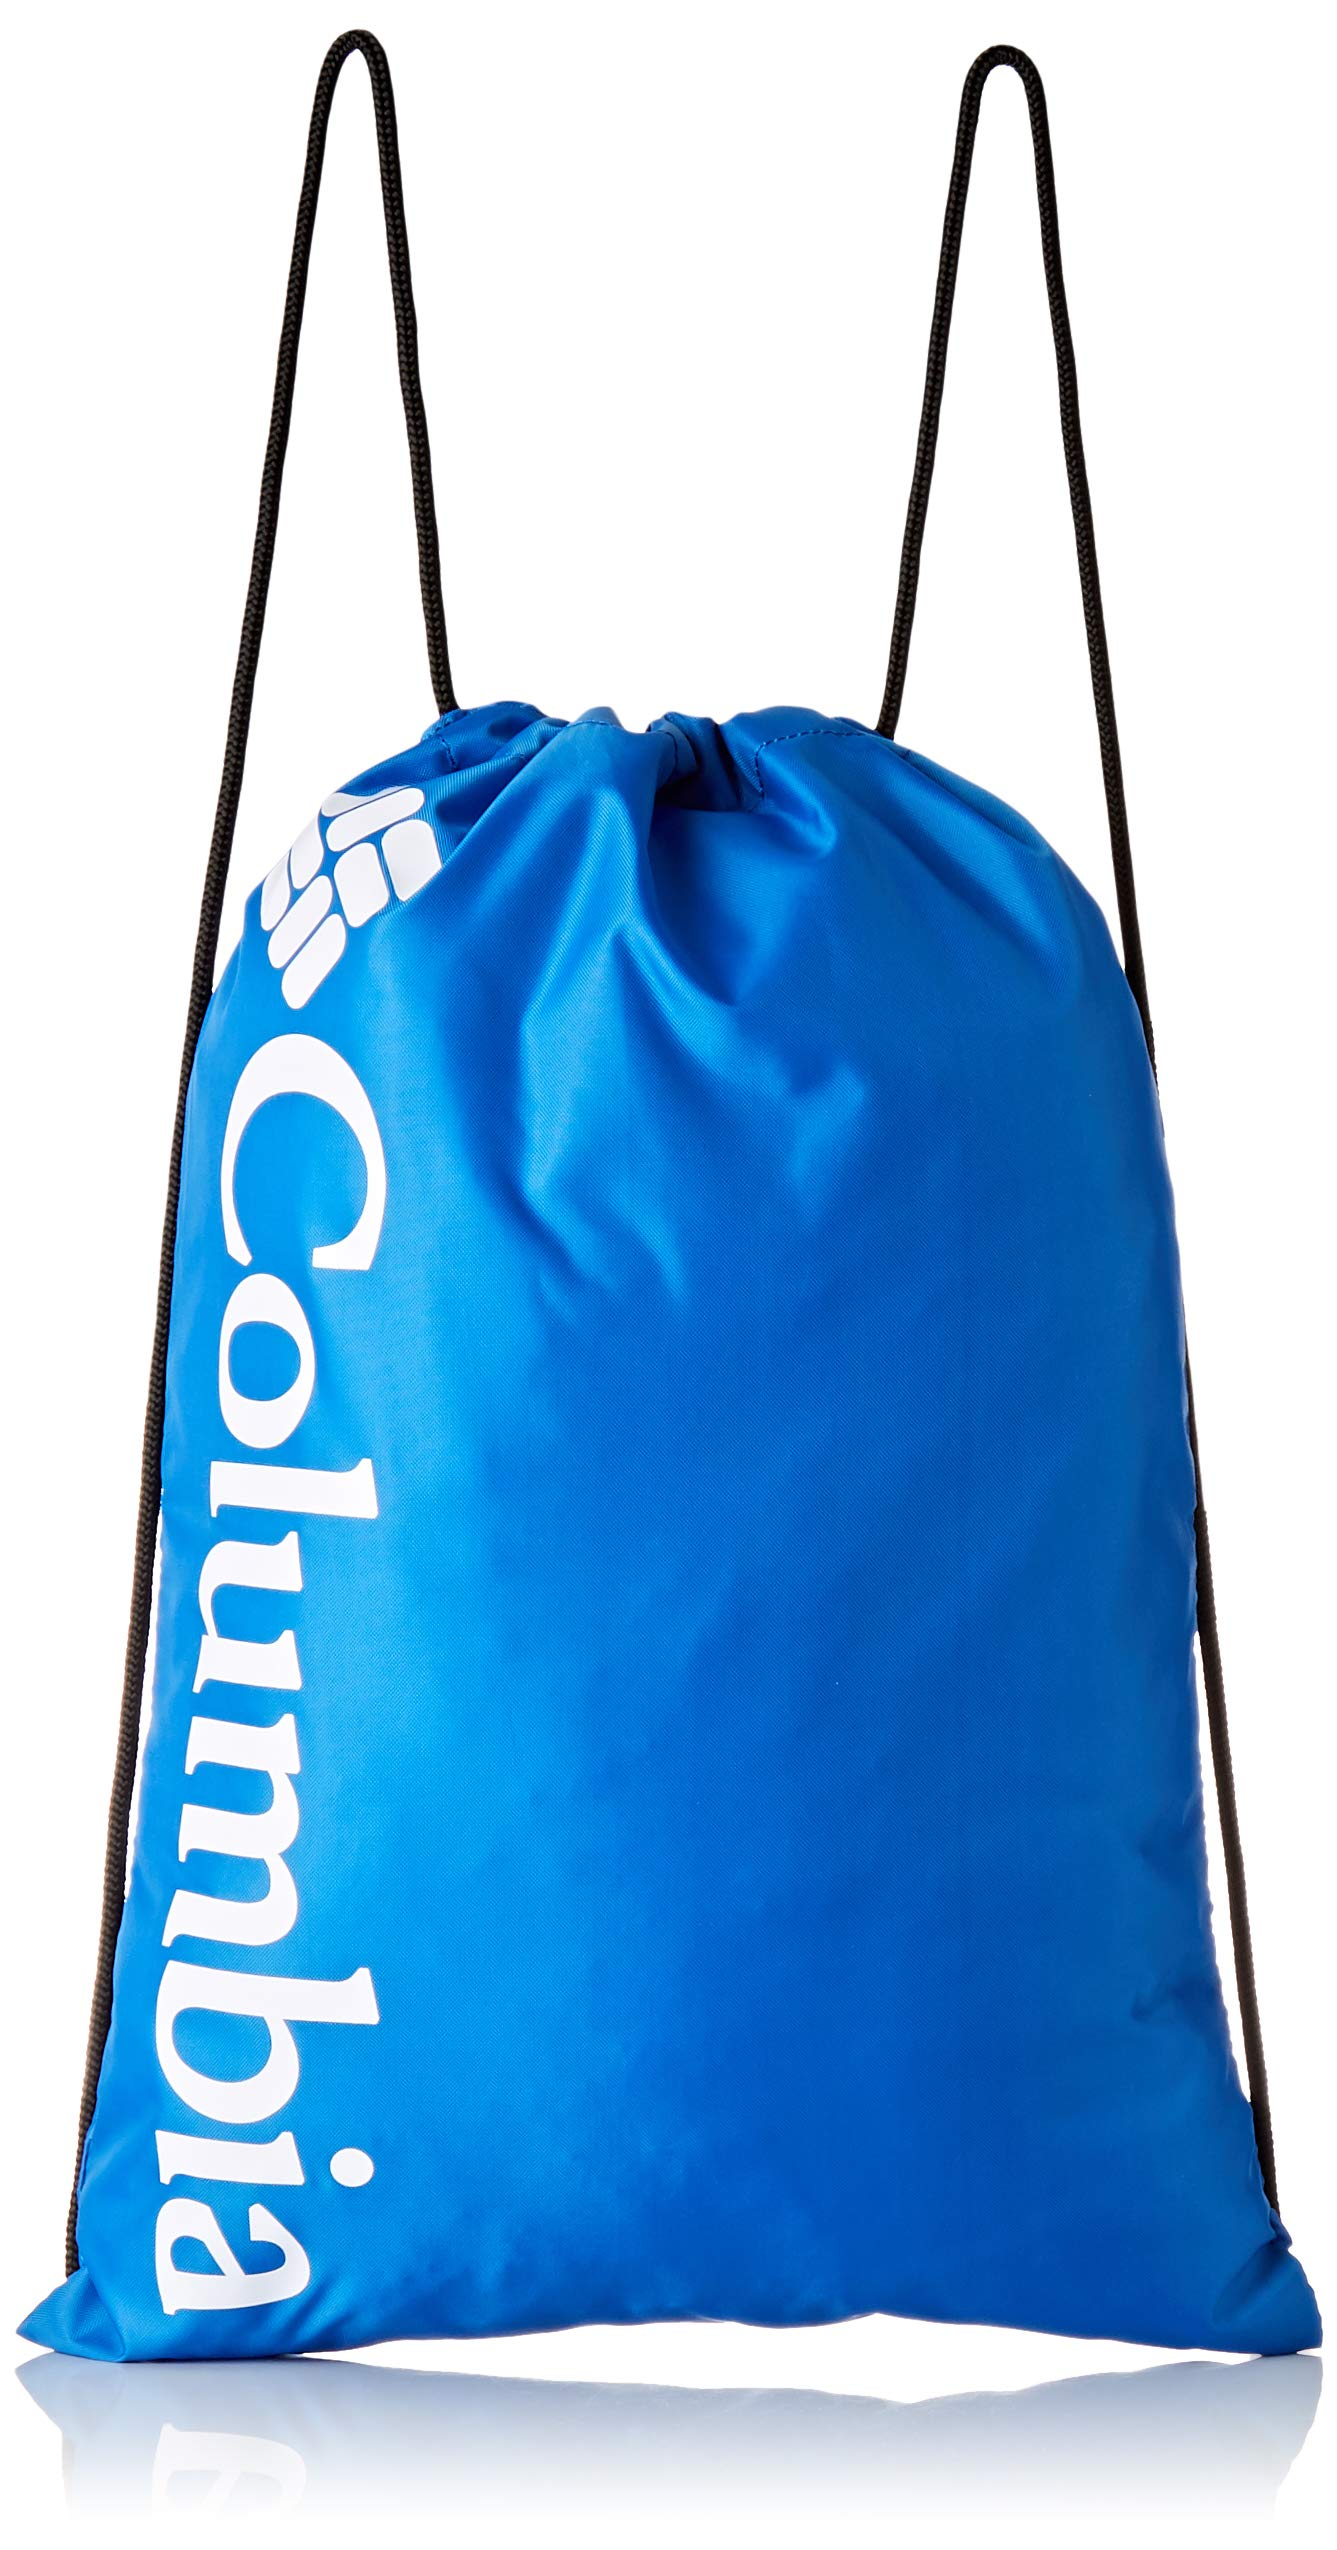 Columbia Drawstring Bag, Super Blue, White, O/S